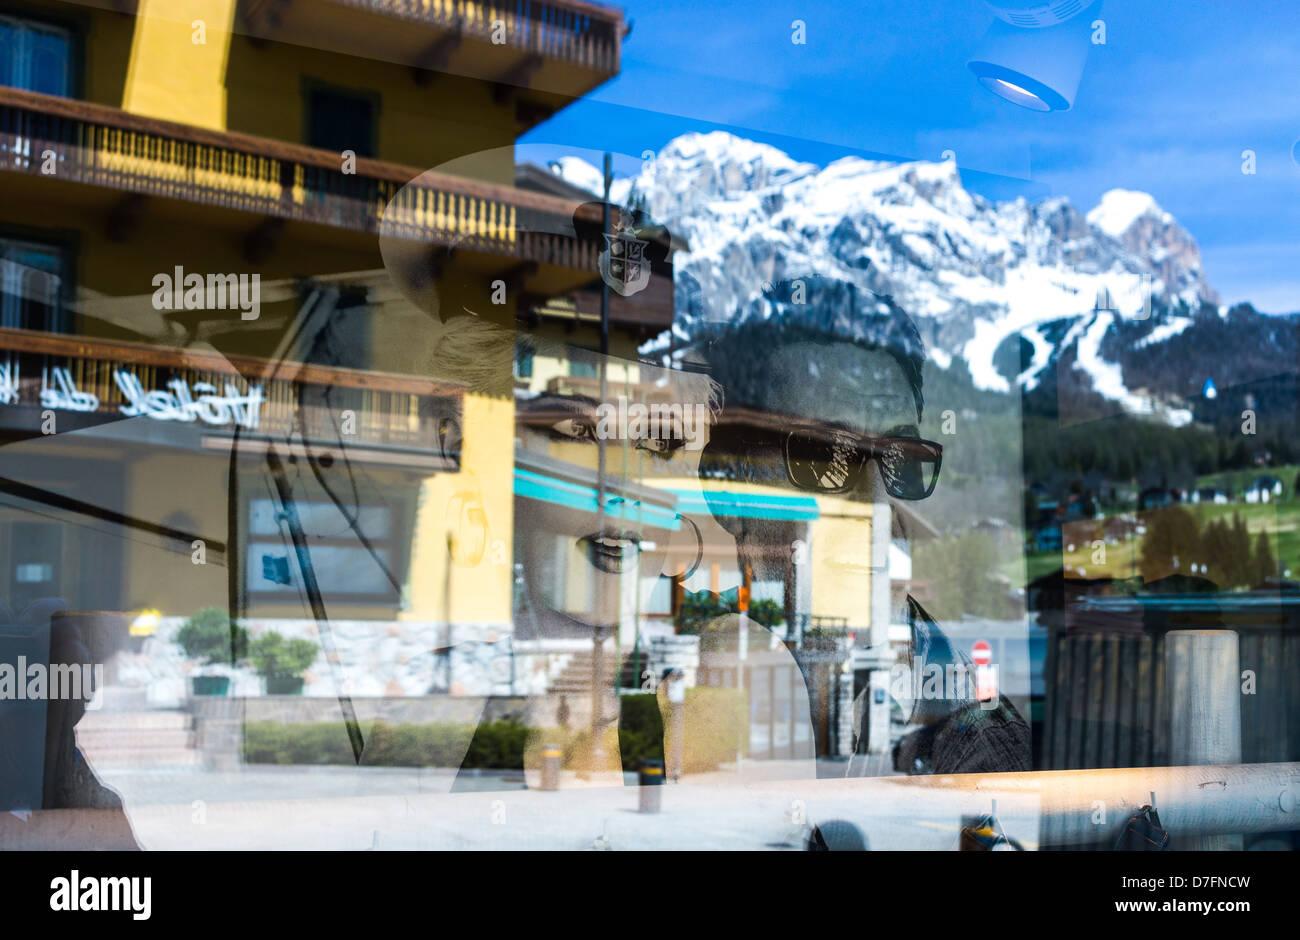 Italy Dolomites Veneto Cortina D'Ampezzo reflections of luxury stores shopwindow - Stock Image